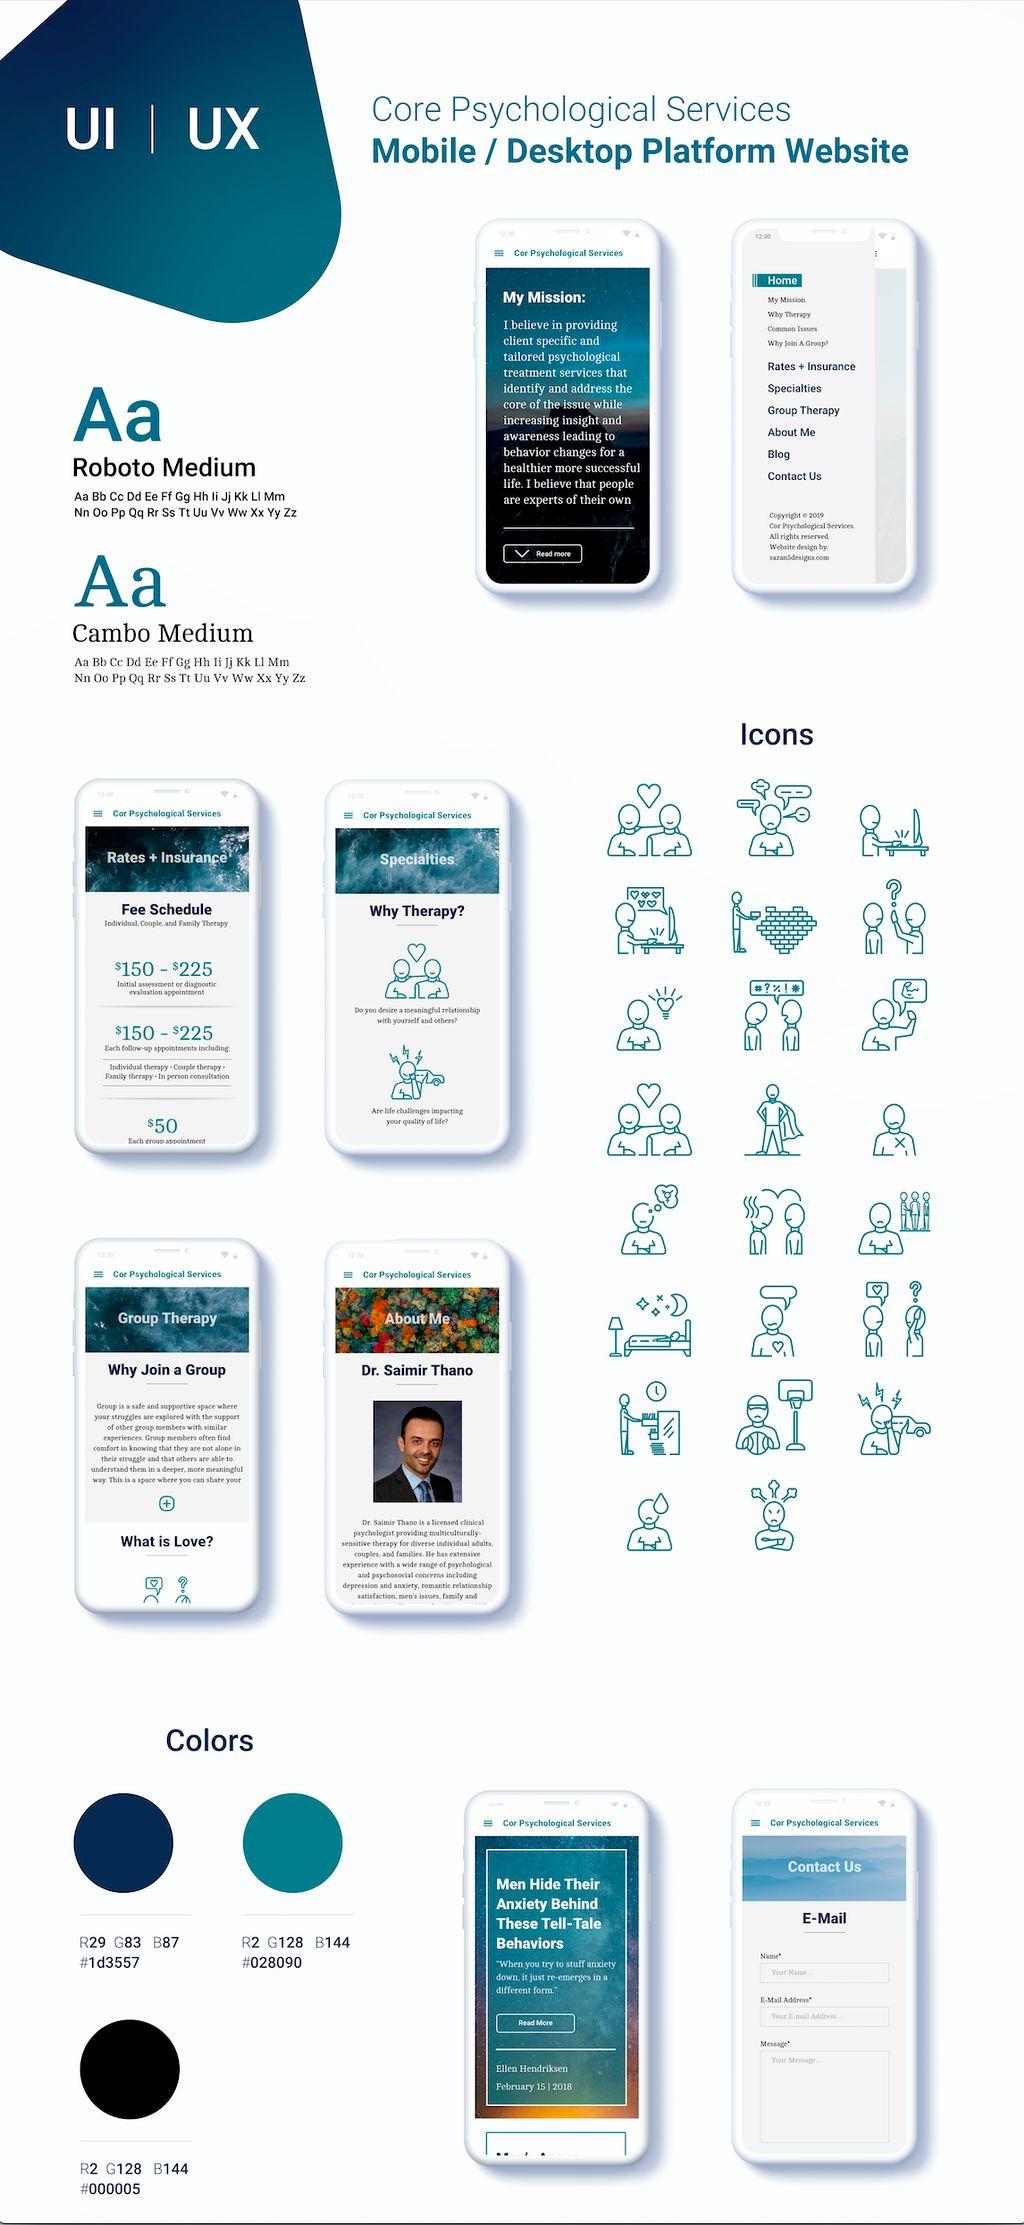 UI UX Mobile and Desktop Cor Psychological Services Web